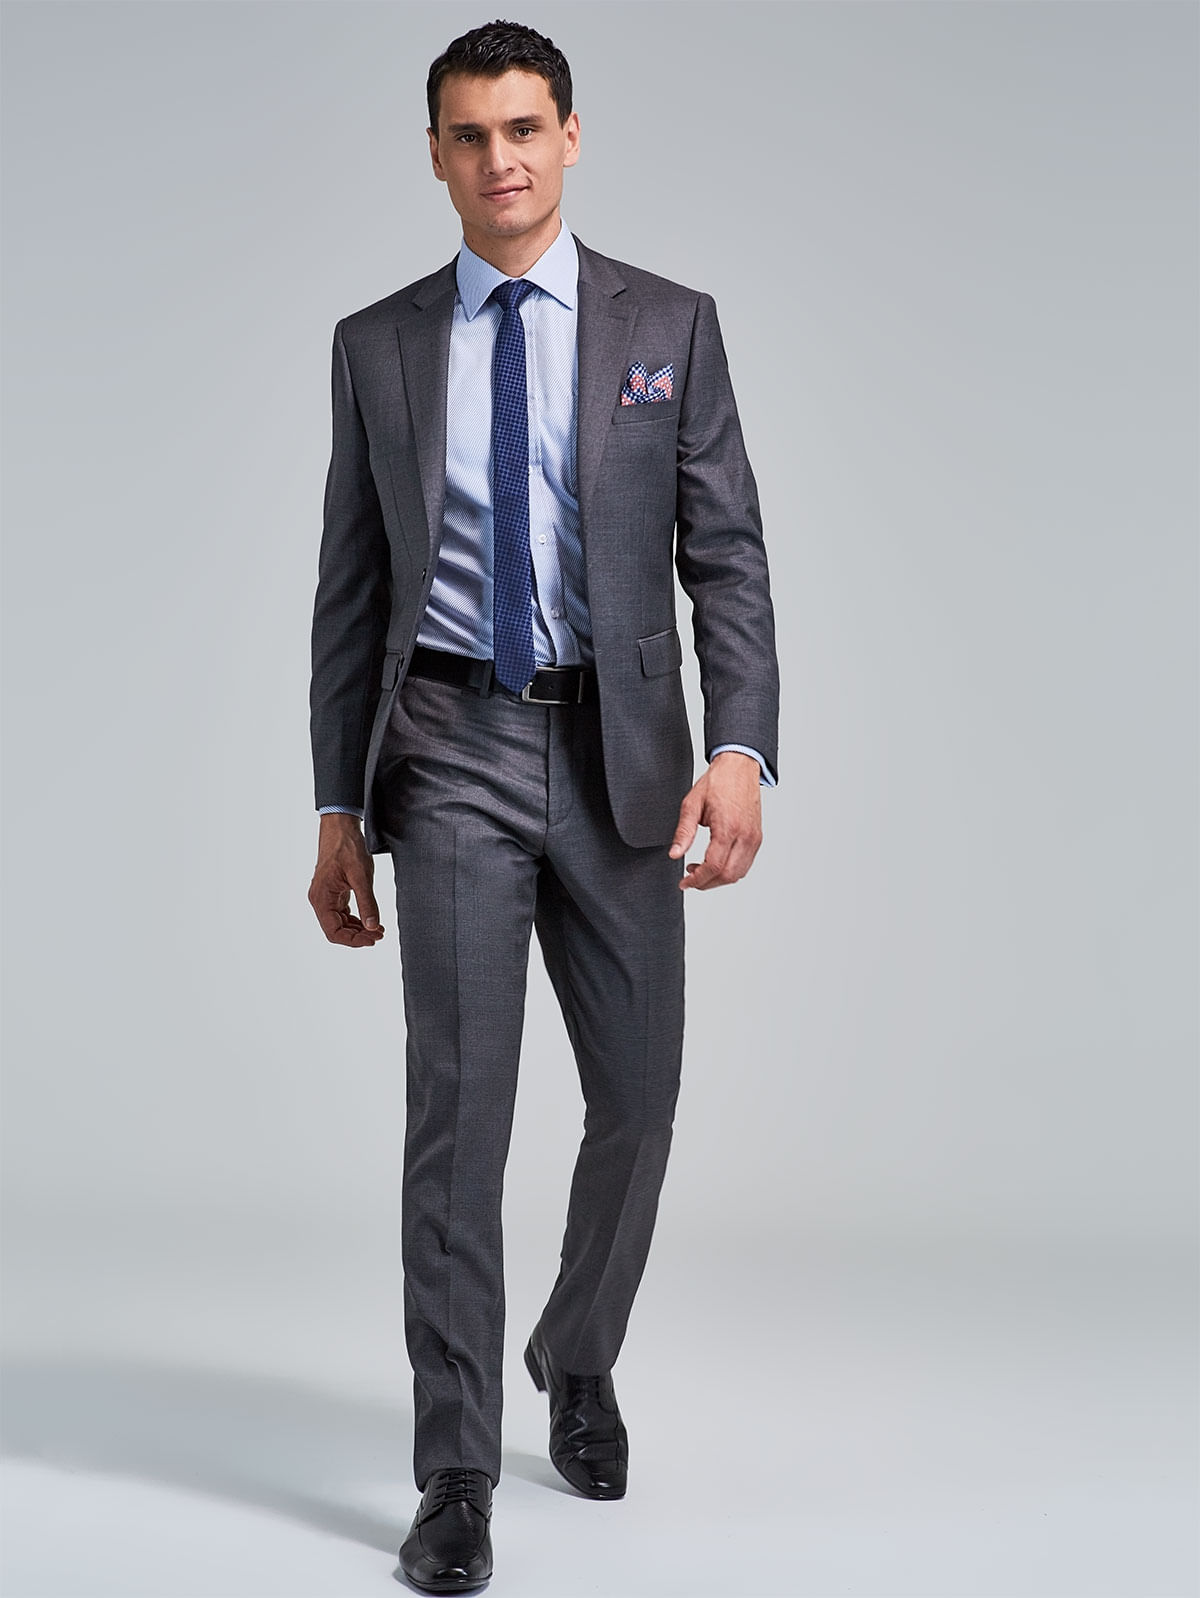 7c6fdd4714 Arturo Calle · Hombre · Business · Vestidos · Traje Slim Fit Cerruti  Textura 78600 ...